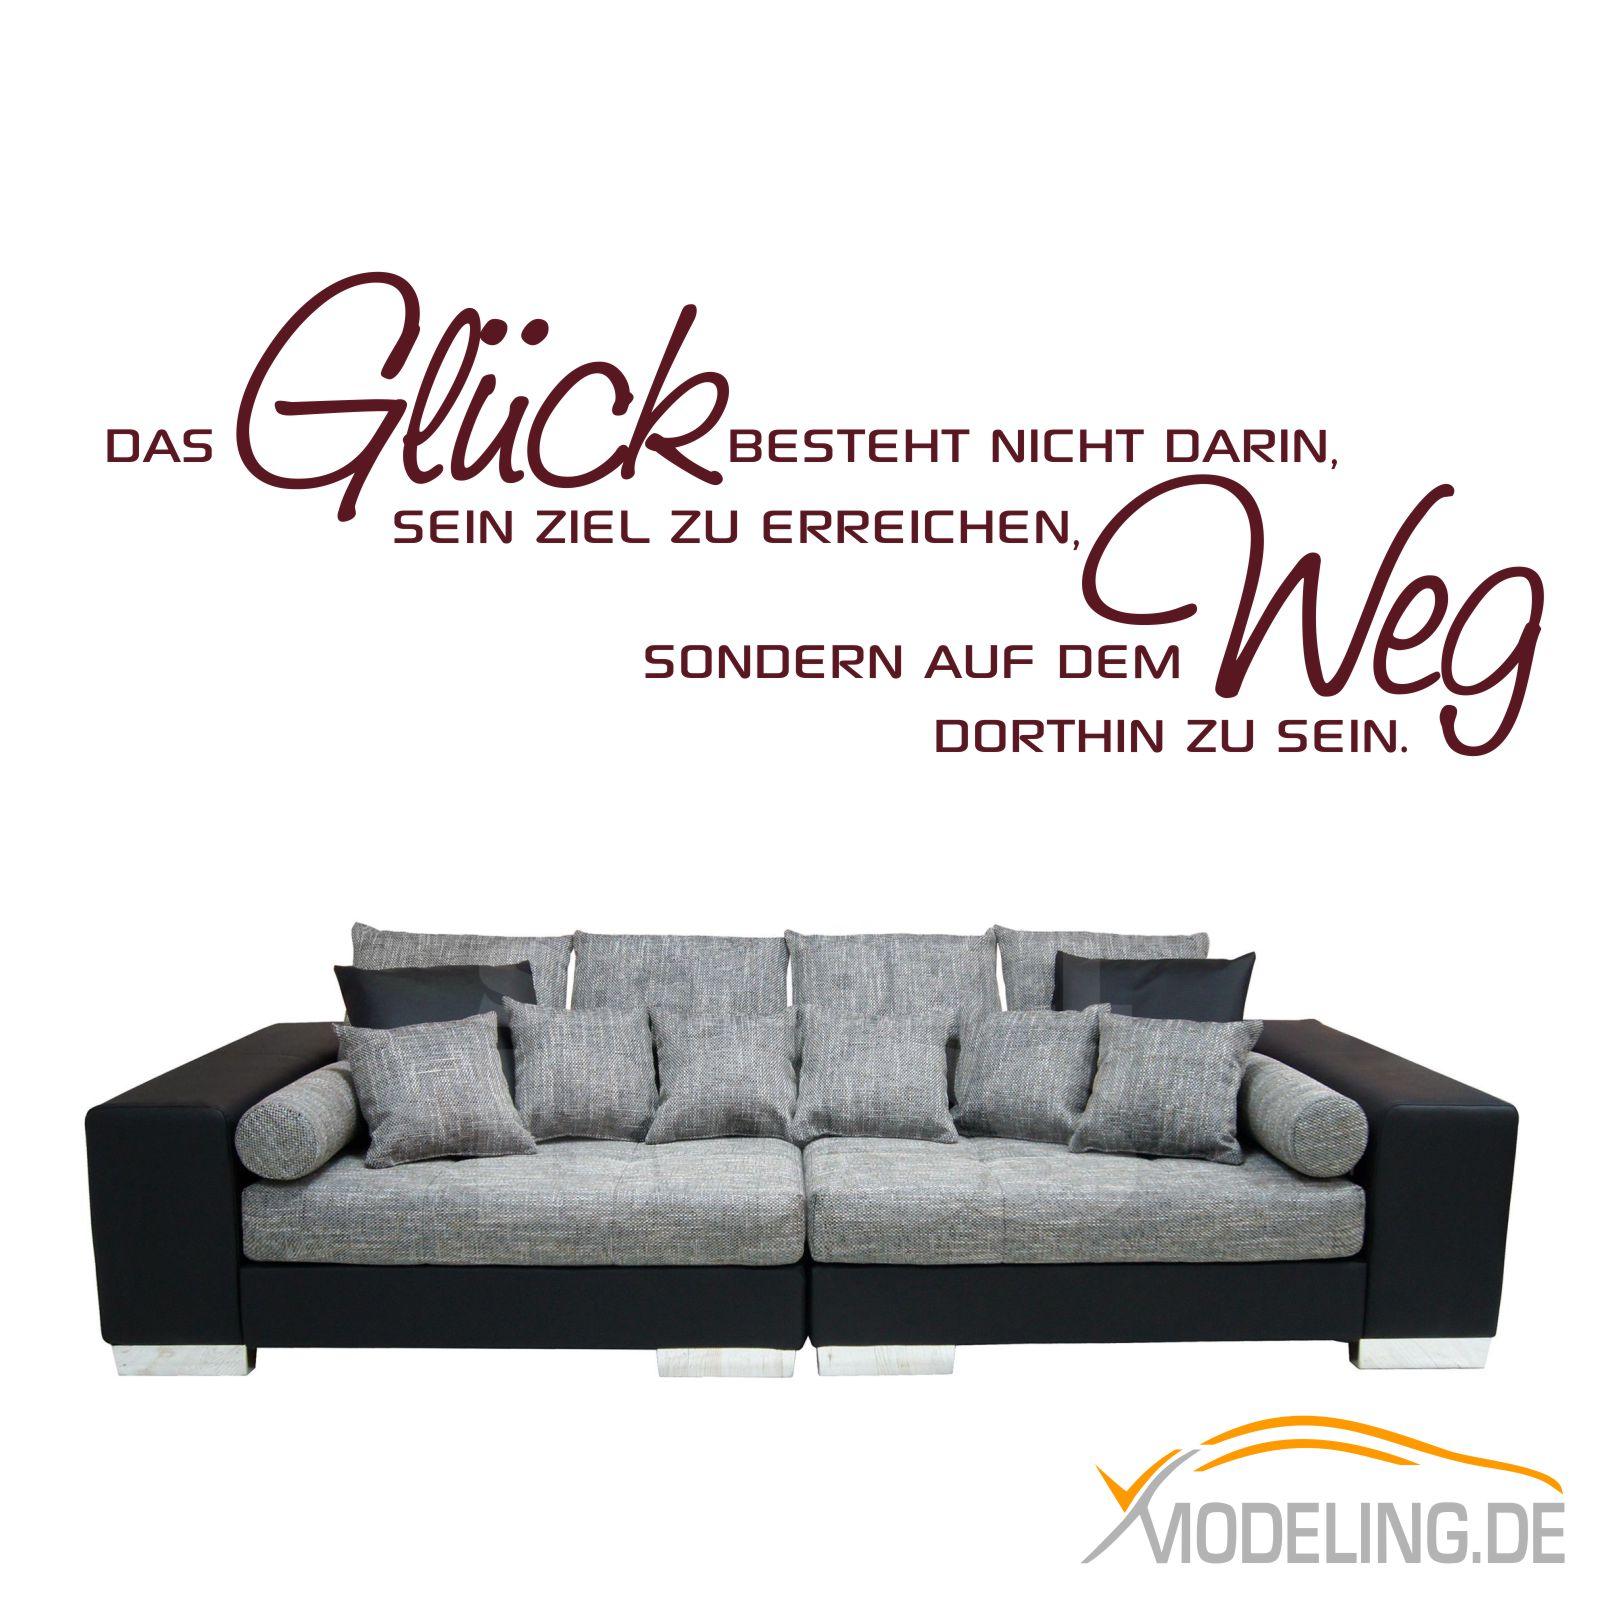 WANDTATTOO 1360 Glueck Weg Ziel Wohnzimmer Wandaufkleber Sprueche